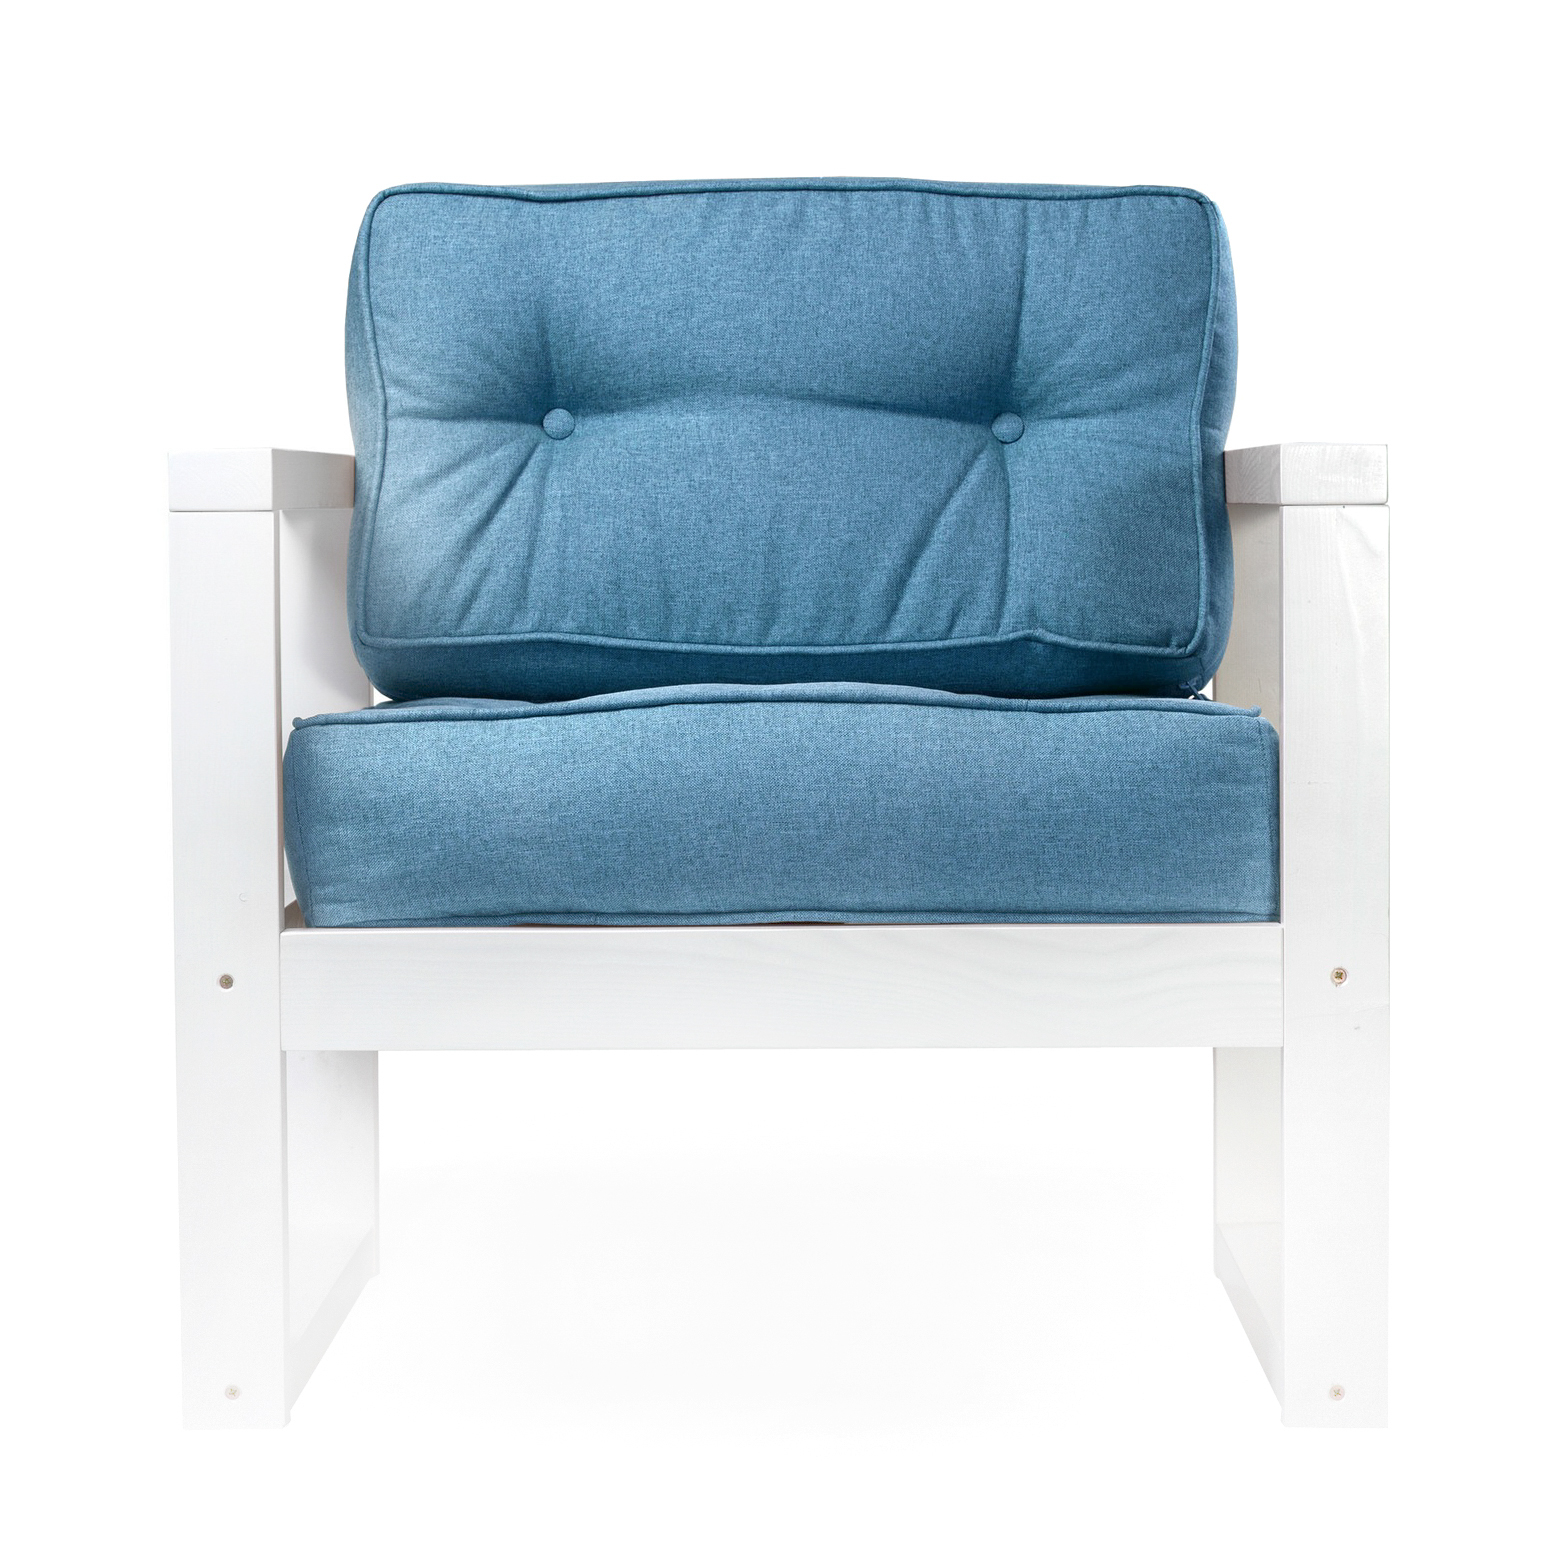 Кресло AS Алекс 80x73x65 белый/голубой фото